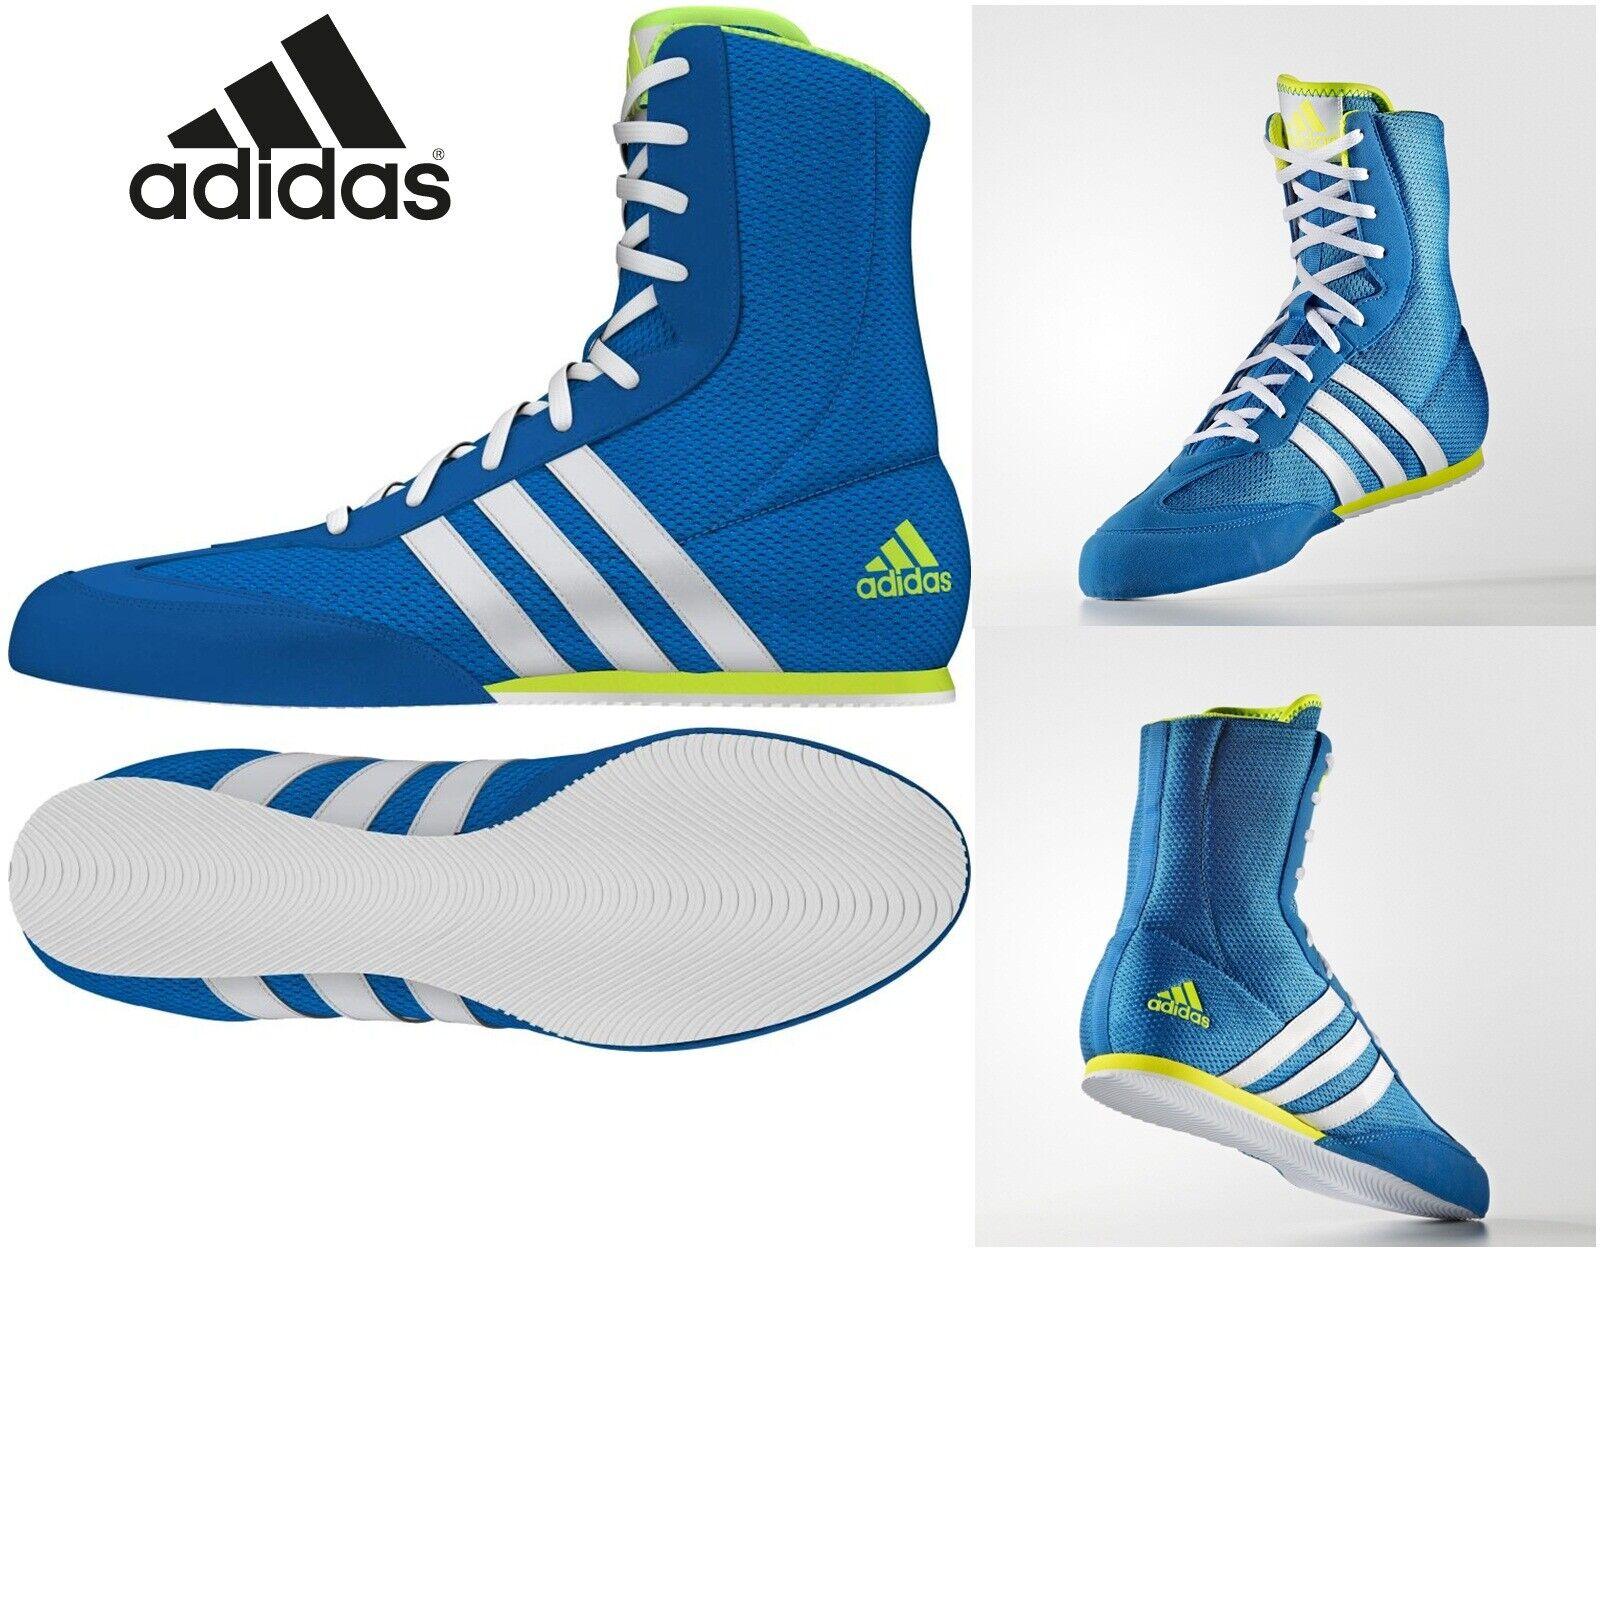 Adidas scatola hog sautope scatolae lotta thai scatolae kick scatolaing mma fitness crossfit